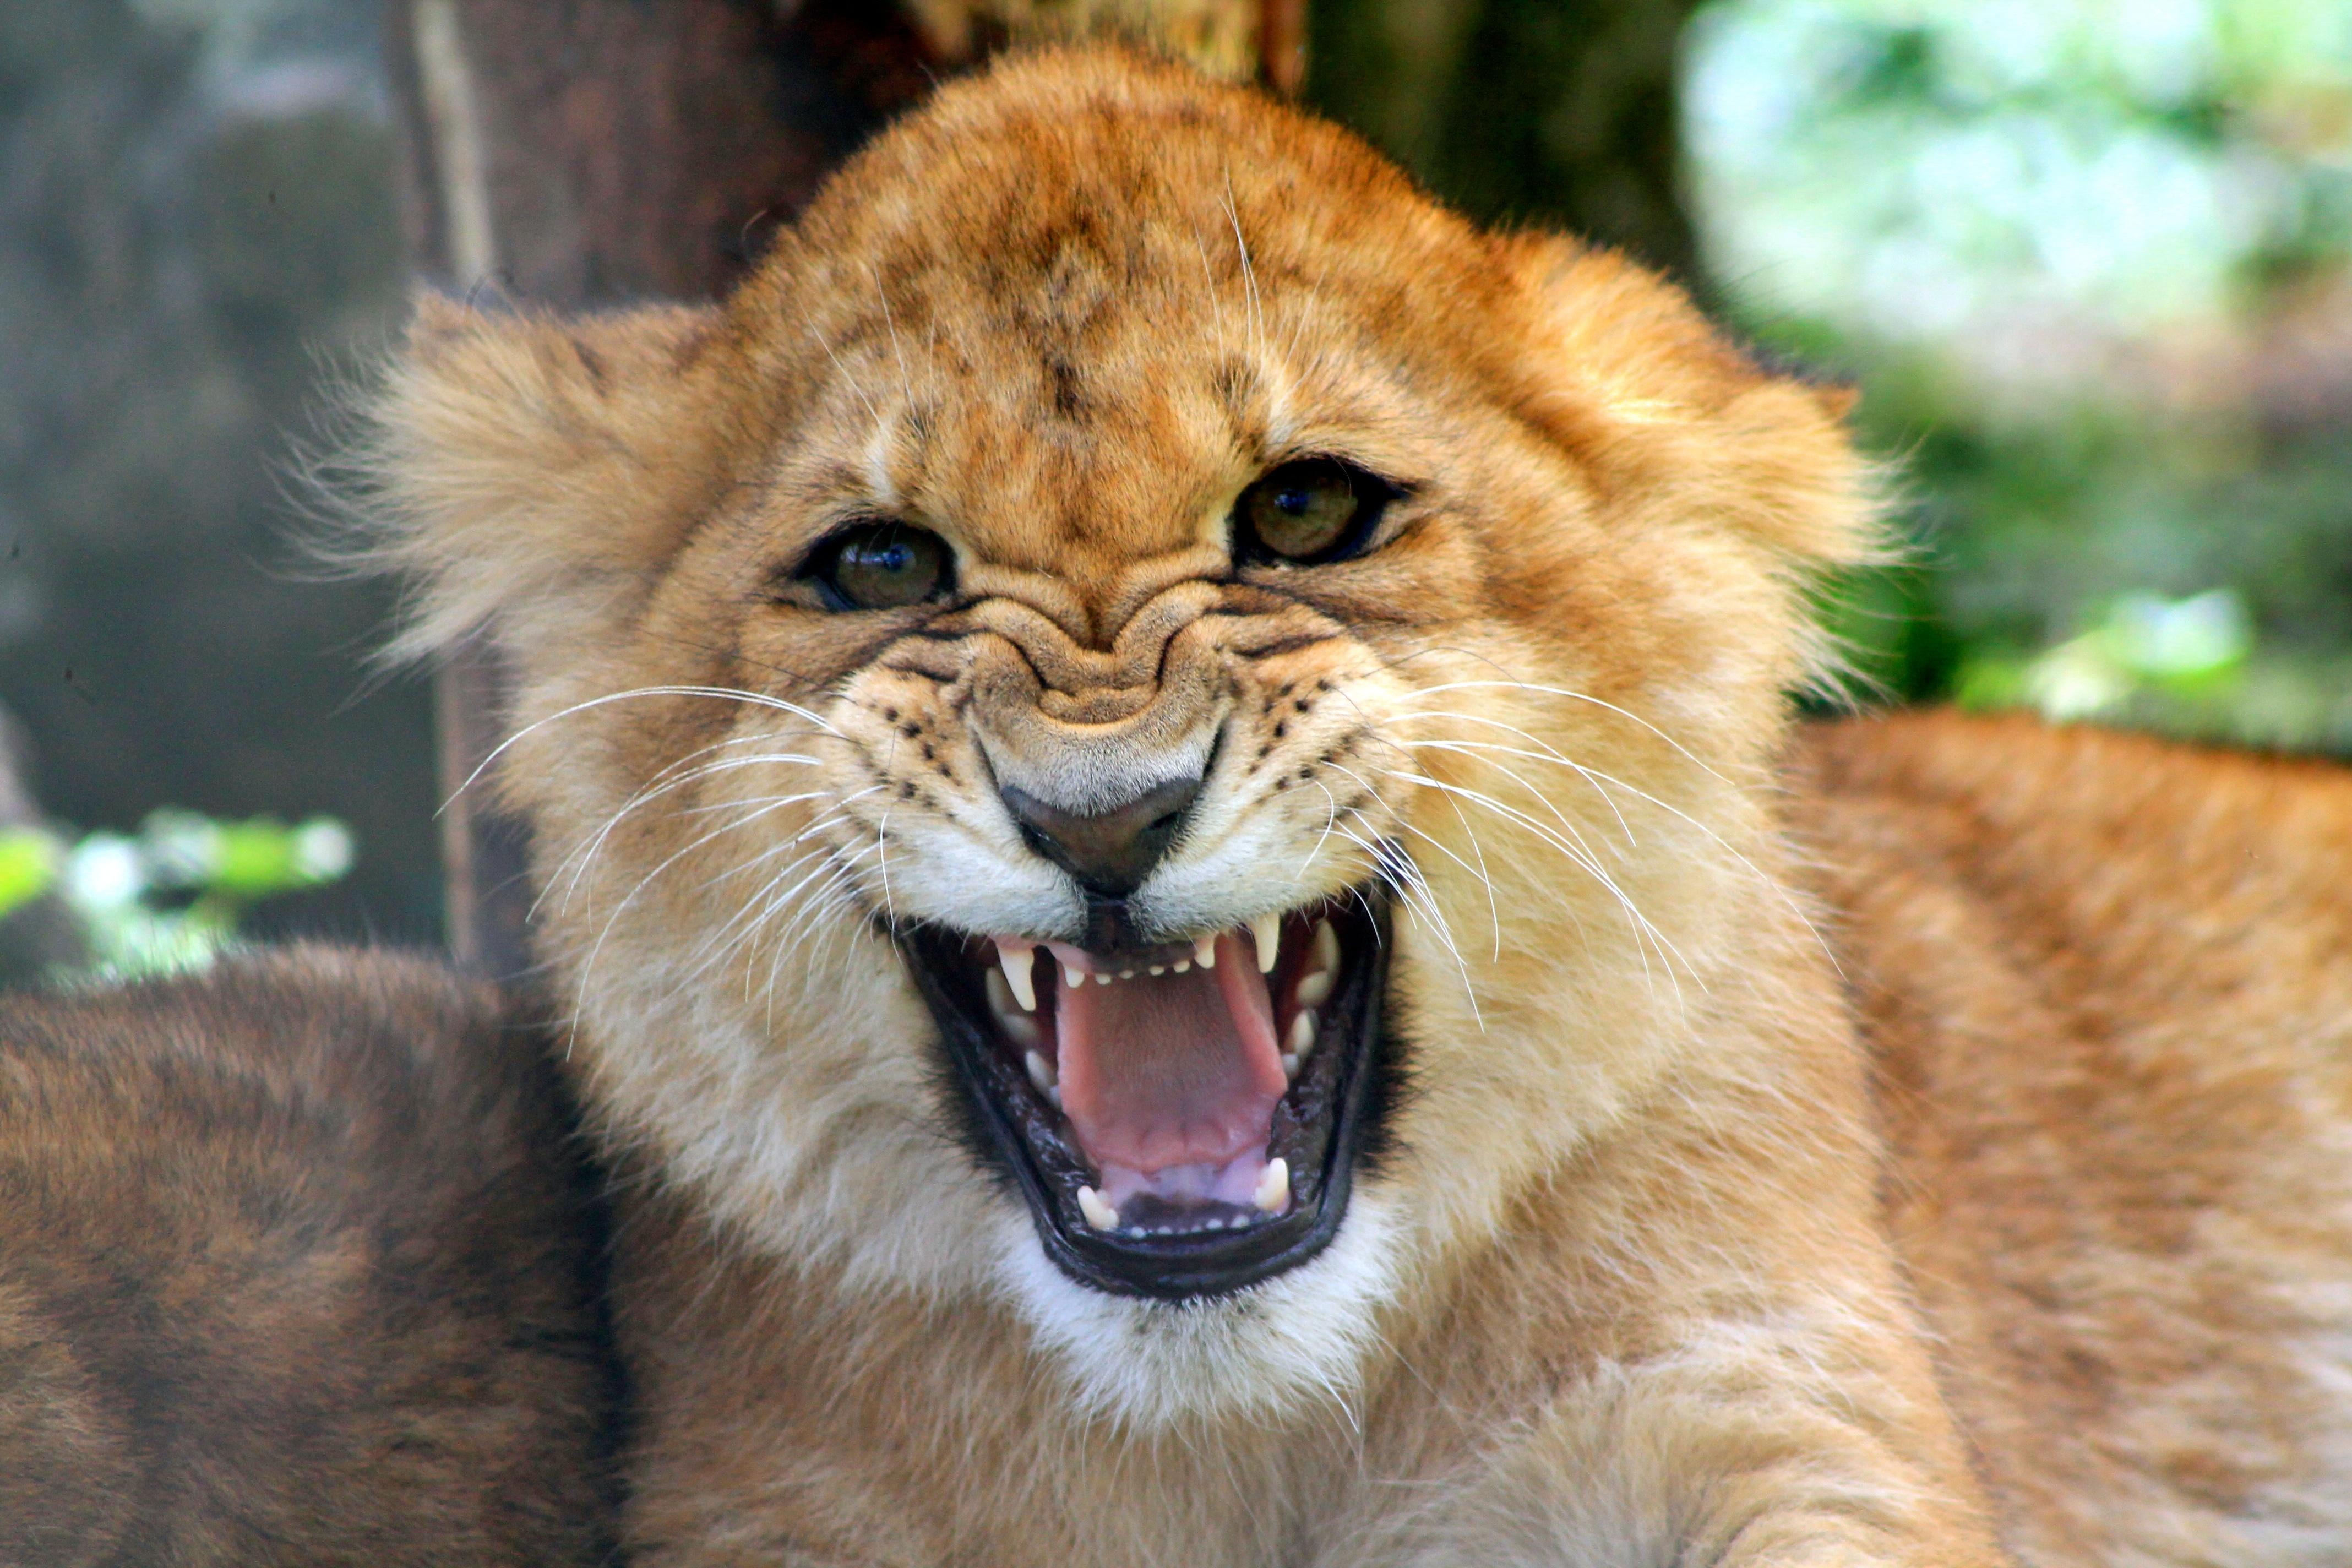 Cachorro león rugiendo - 4272x2848